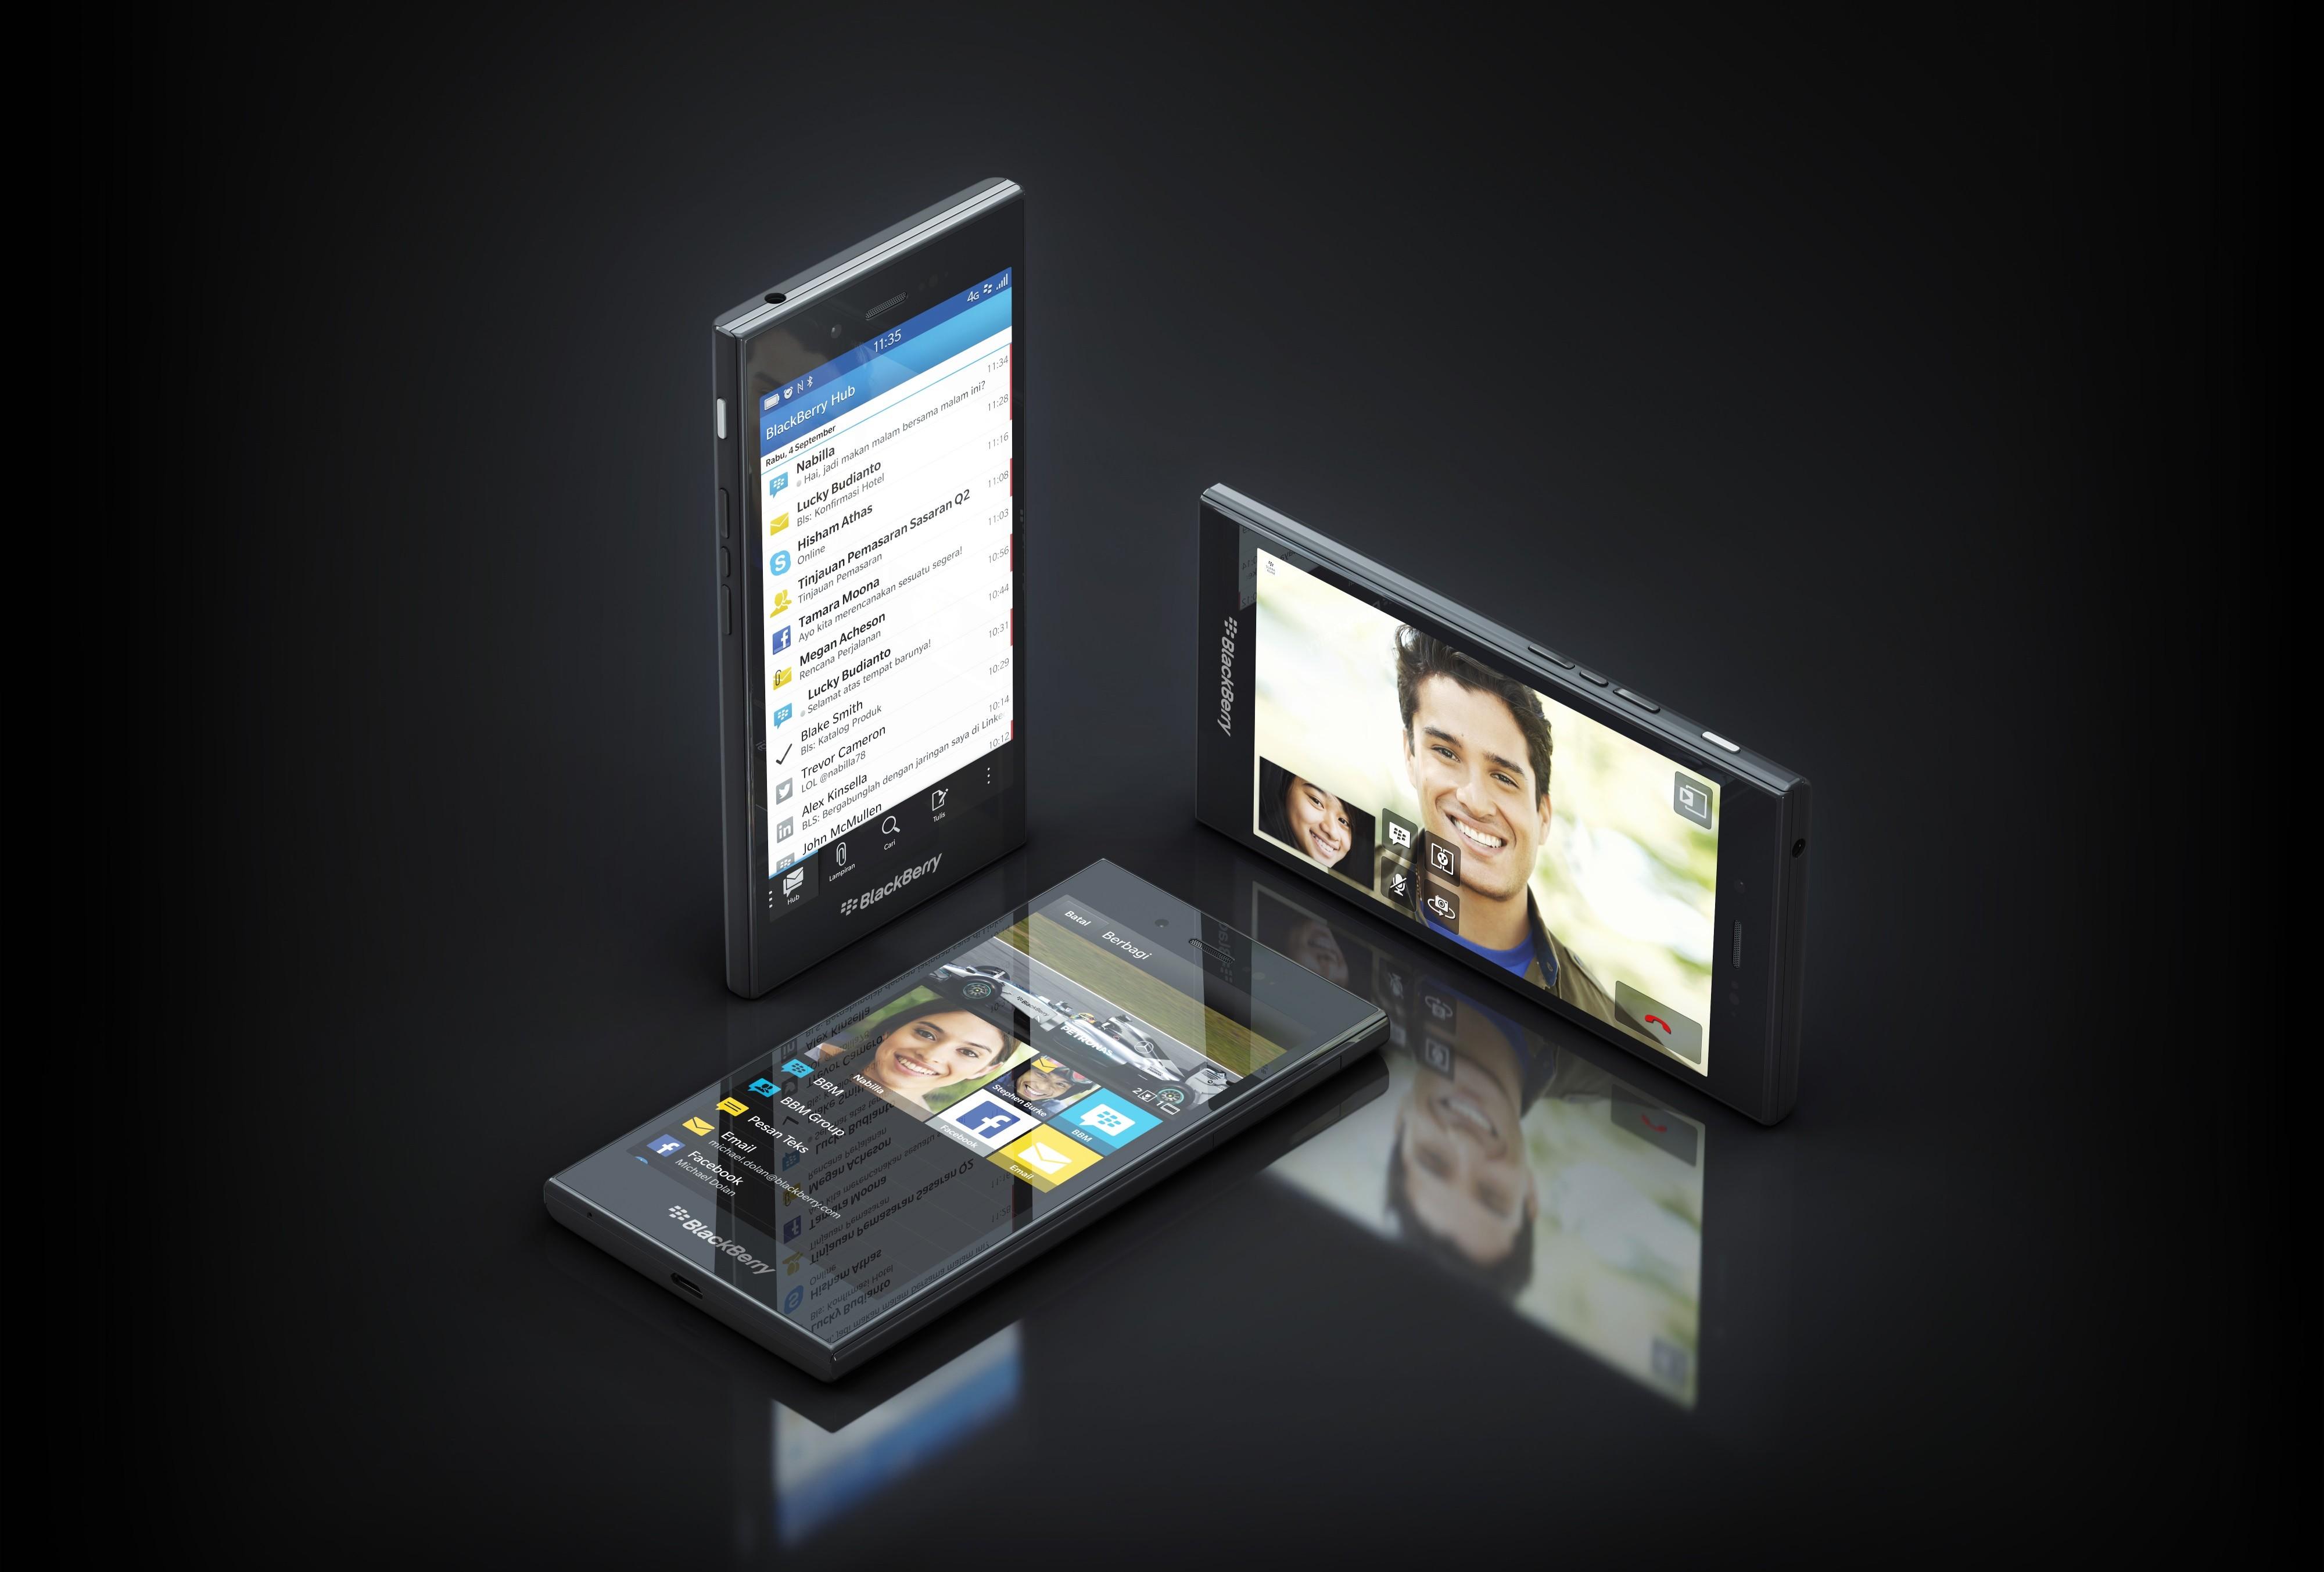 z3 - BlackBerry Z3: Mối lương duyên giữa BlackBerry và Foxconn